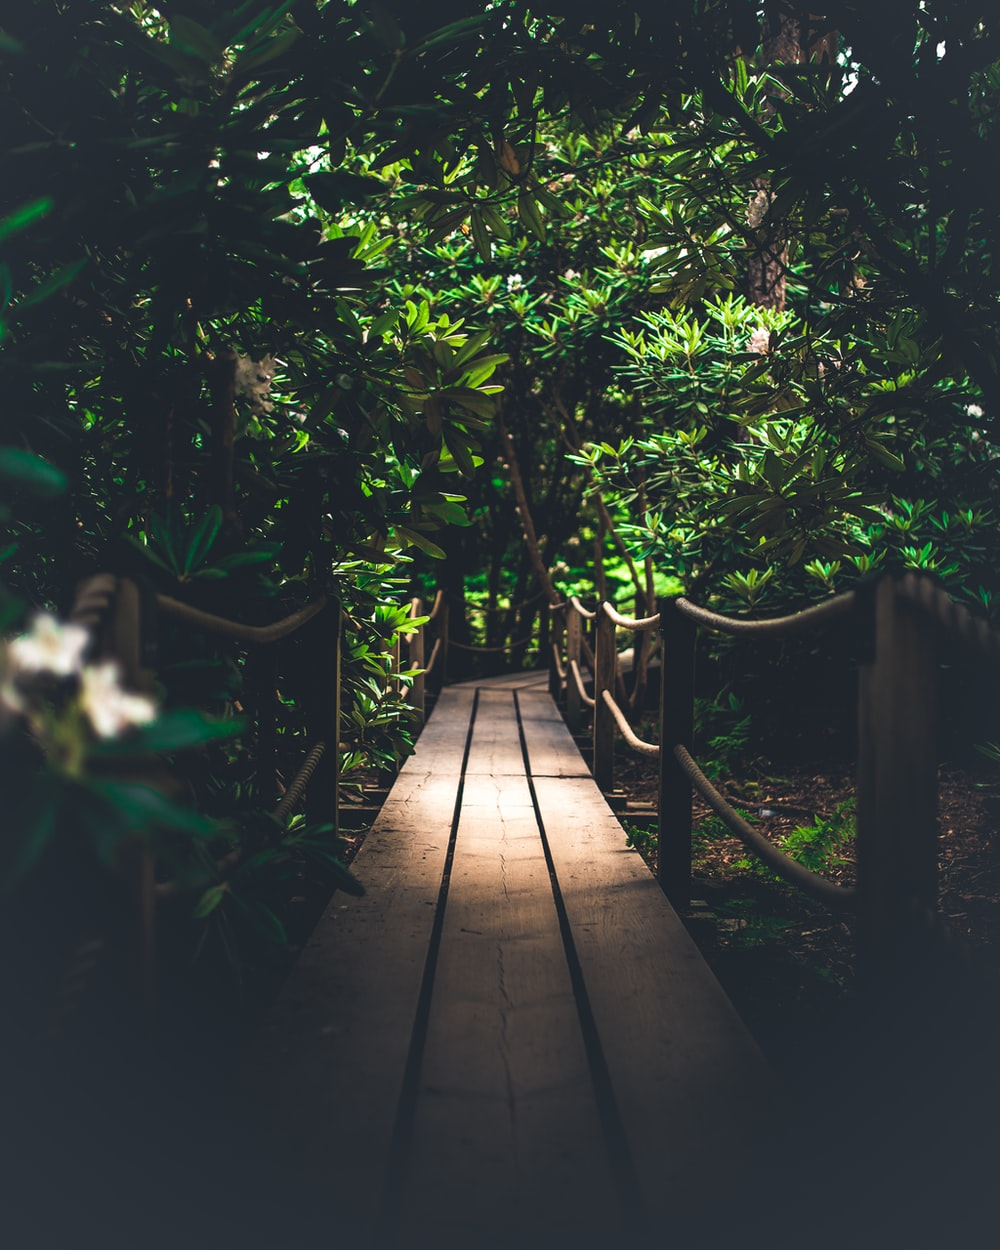 brown wooden pathway